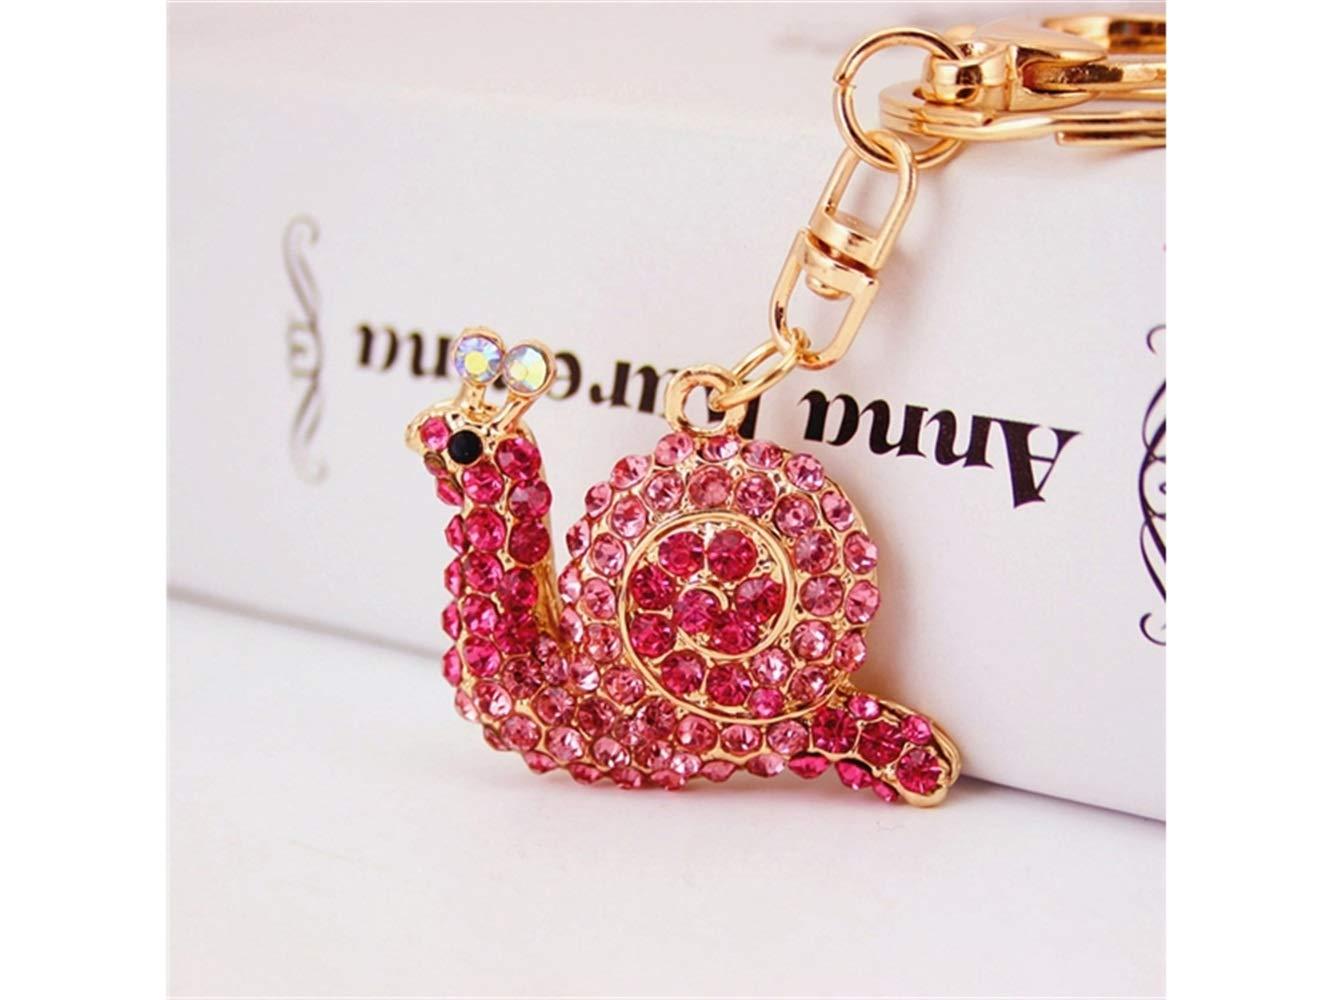 Car Keychain, Cute Small Snail Keychain Animal Key Trinket Car Bag Key Holder Decorations(Pink) for Gift